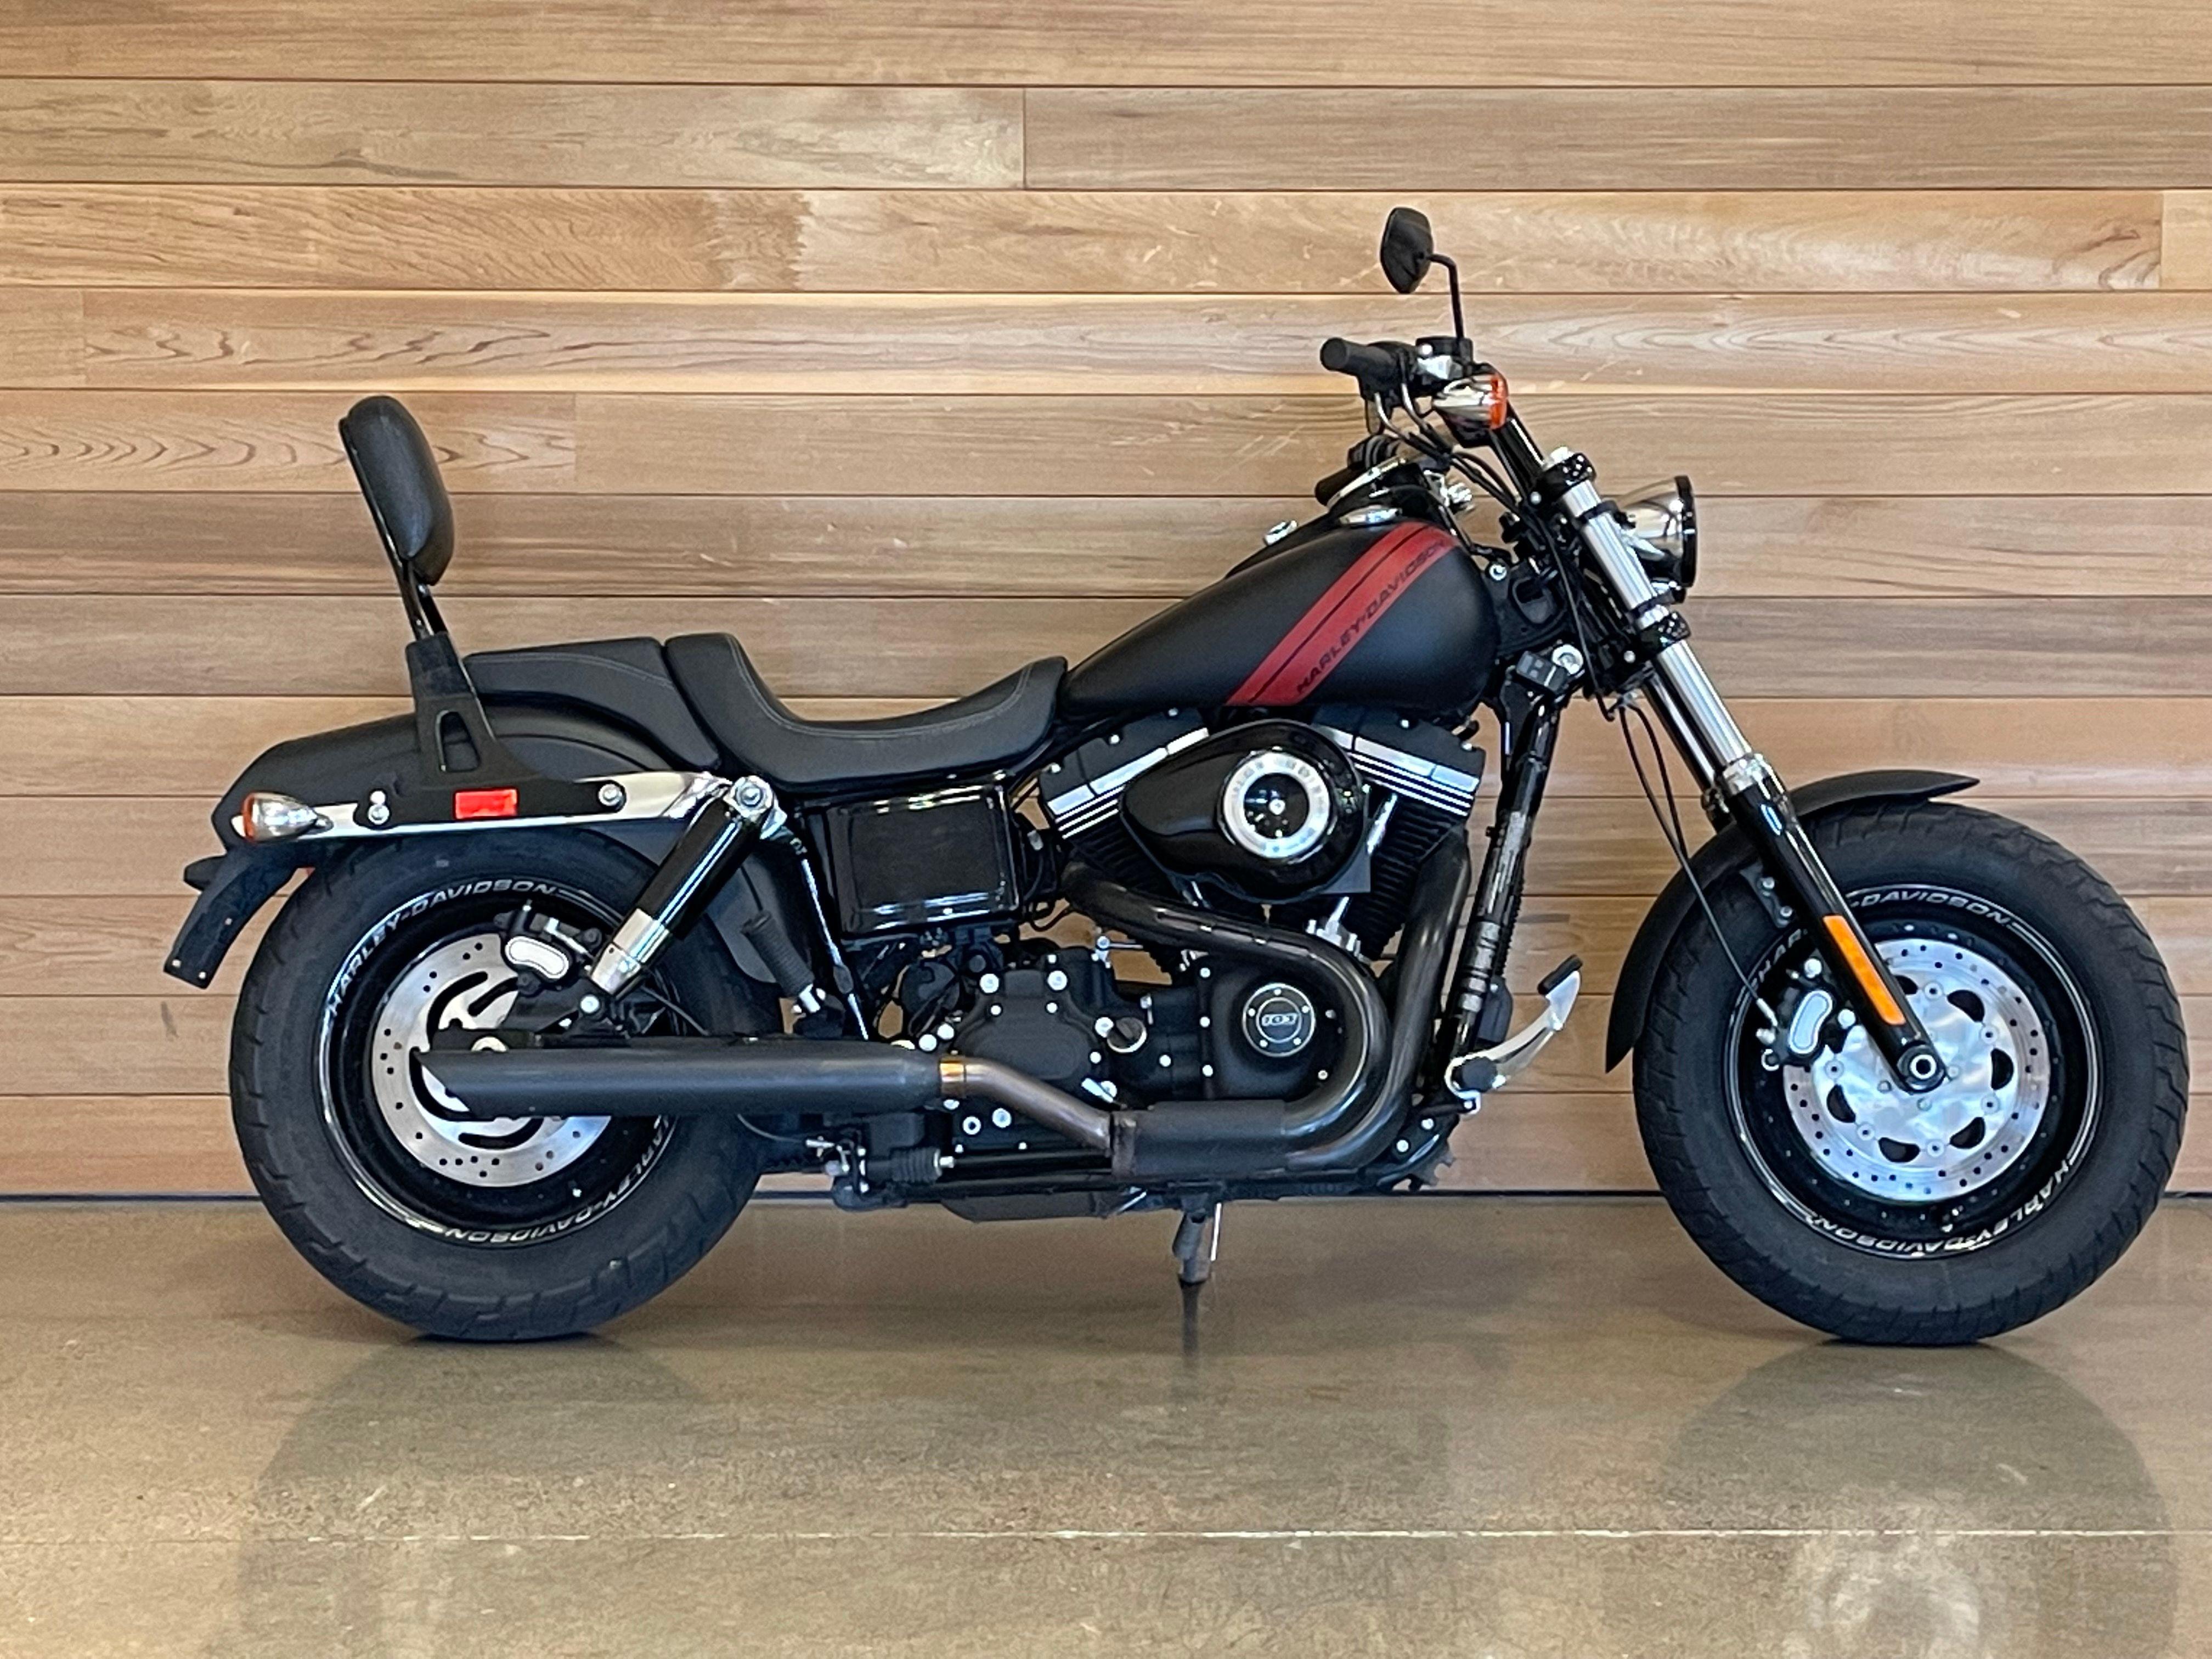 Pre-Owned 2014 Harley-Davidson Fat Bob FXDF